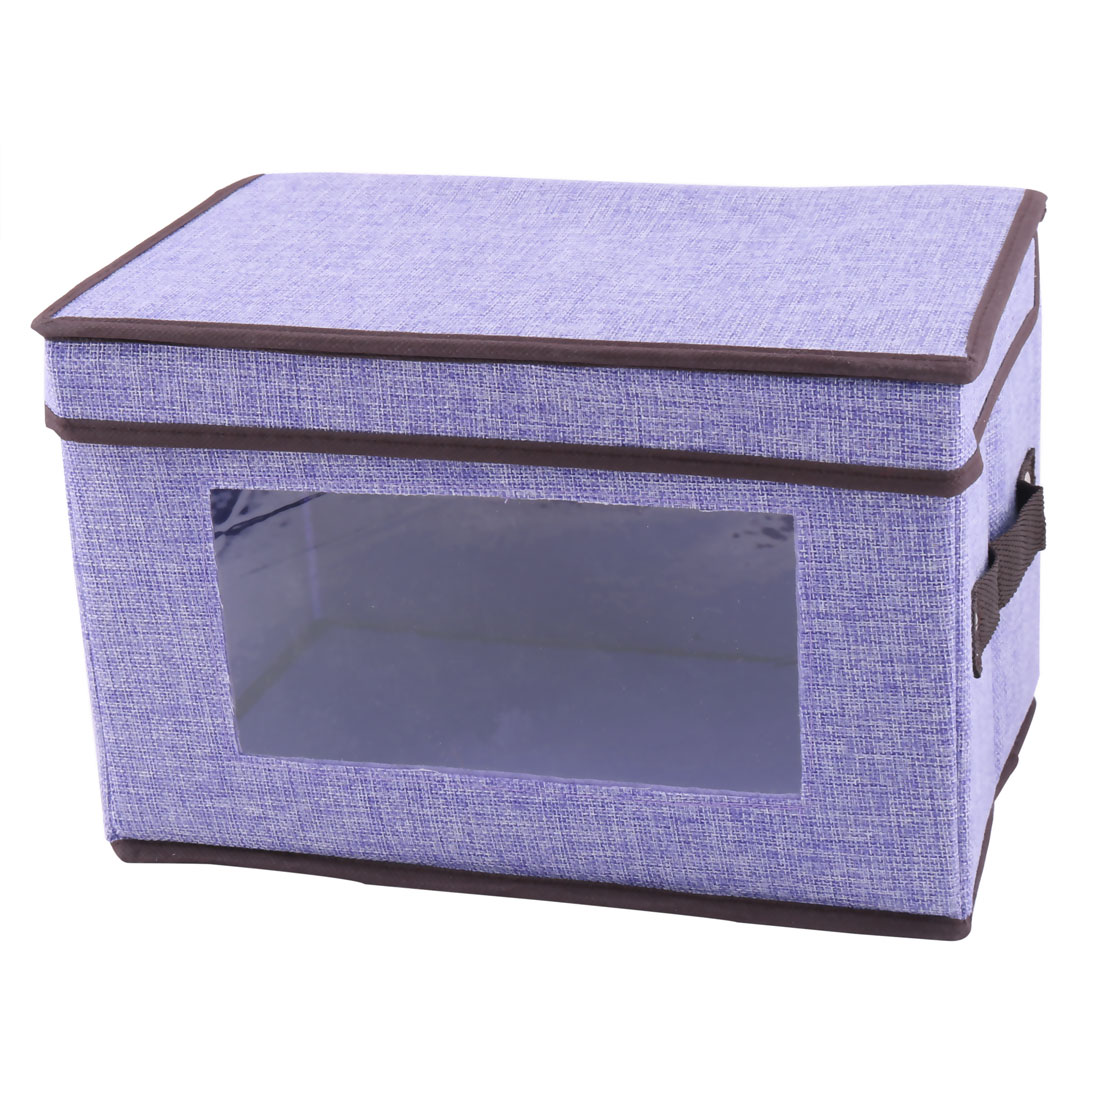 31.5 x 20.5 x 20.5cm Light Purple Linen Foldable Clothes Socks Organizer Box Holder - image 3 of 3